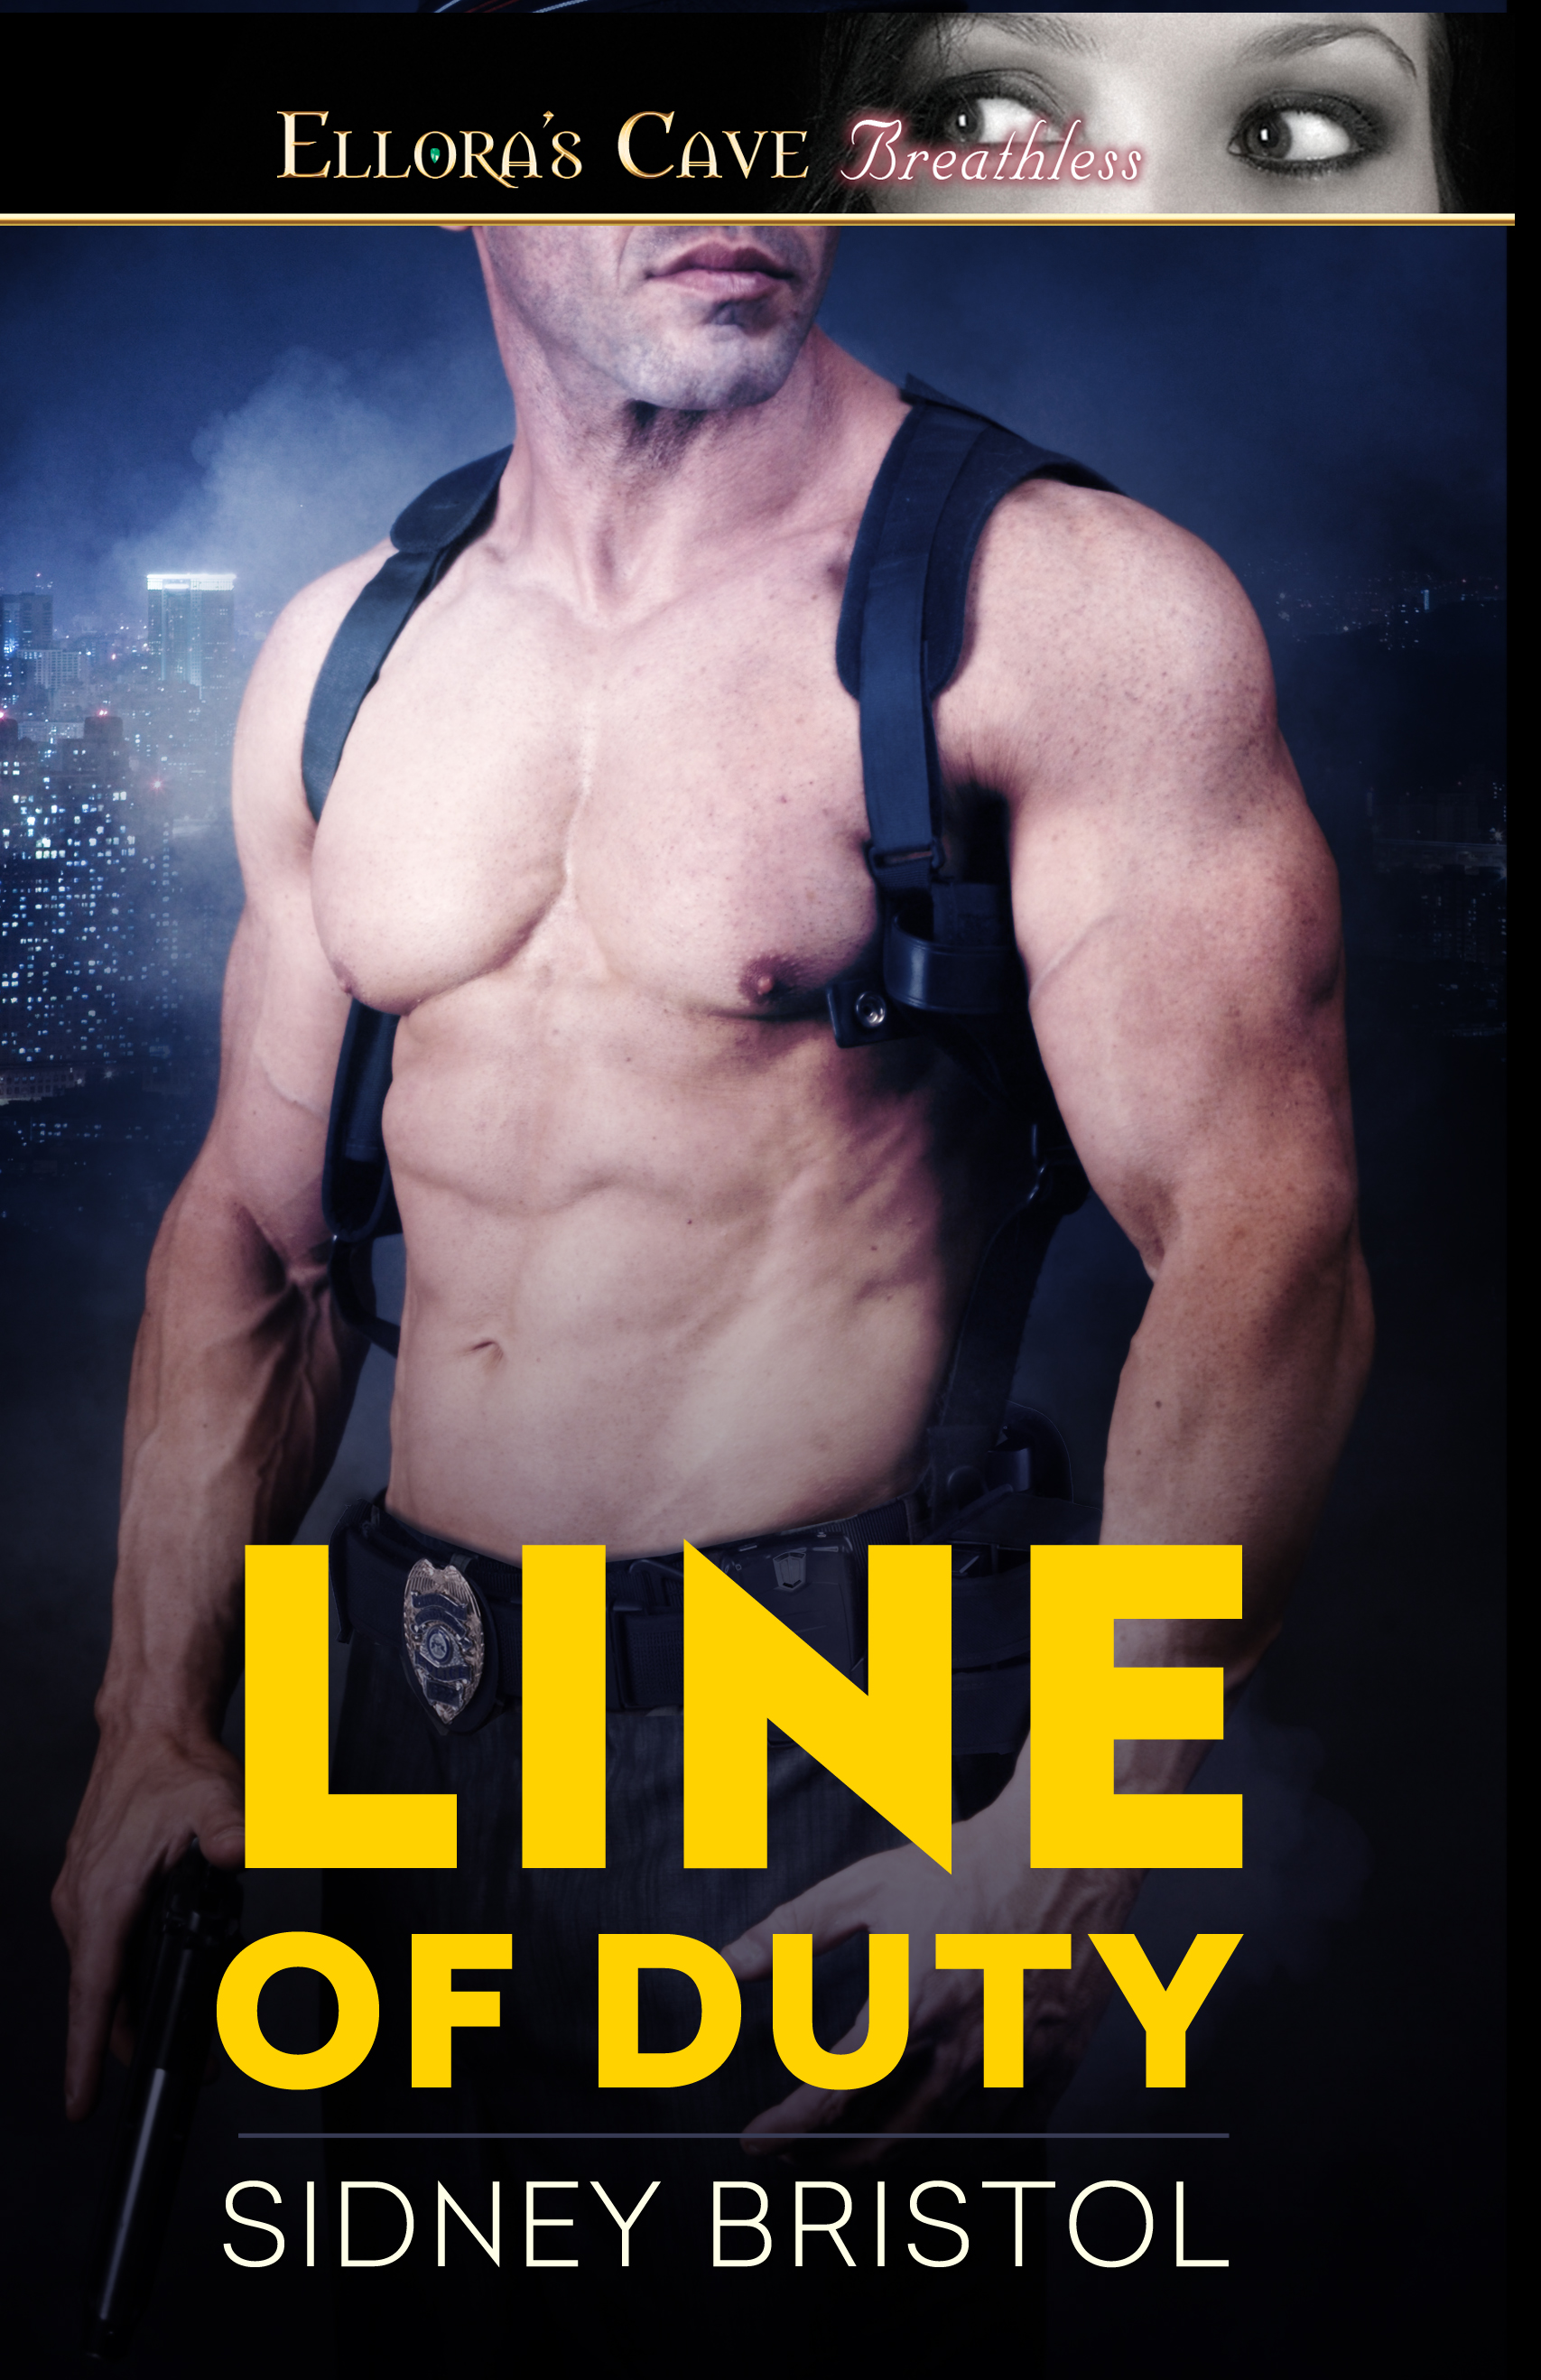 LineOfDuty2 (1)